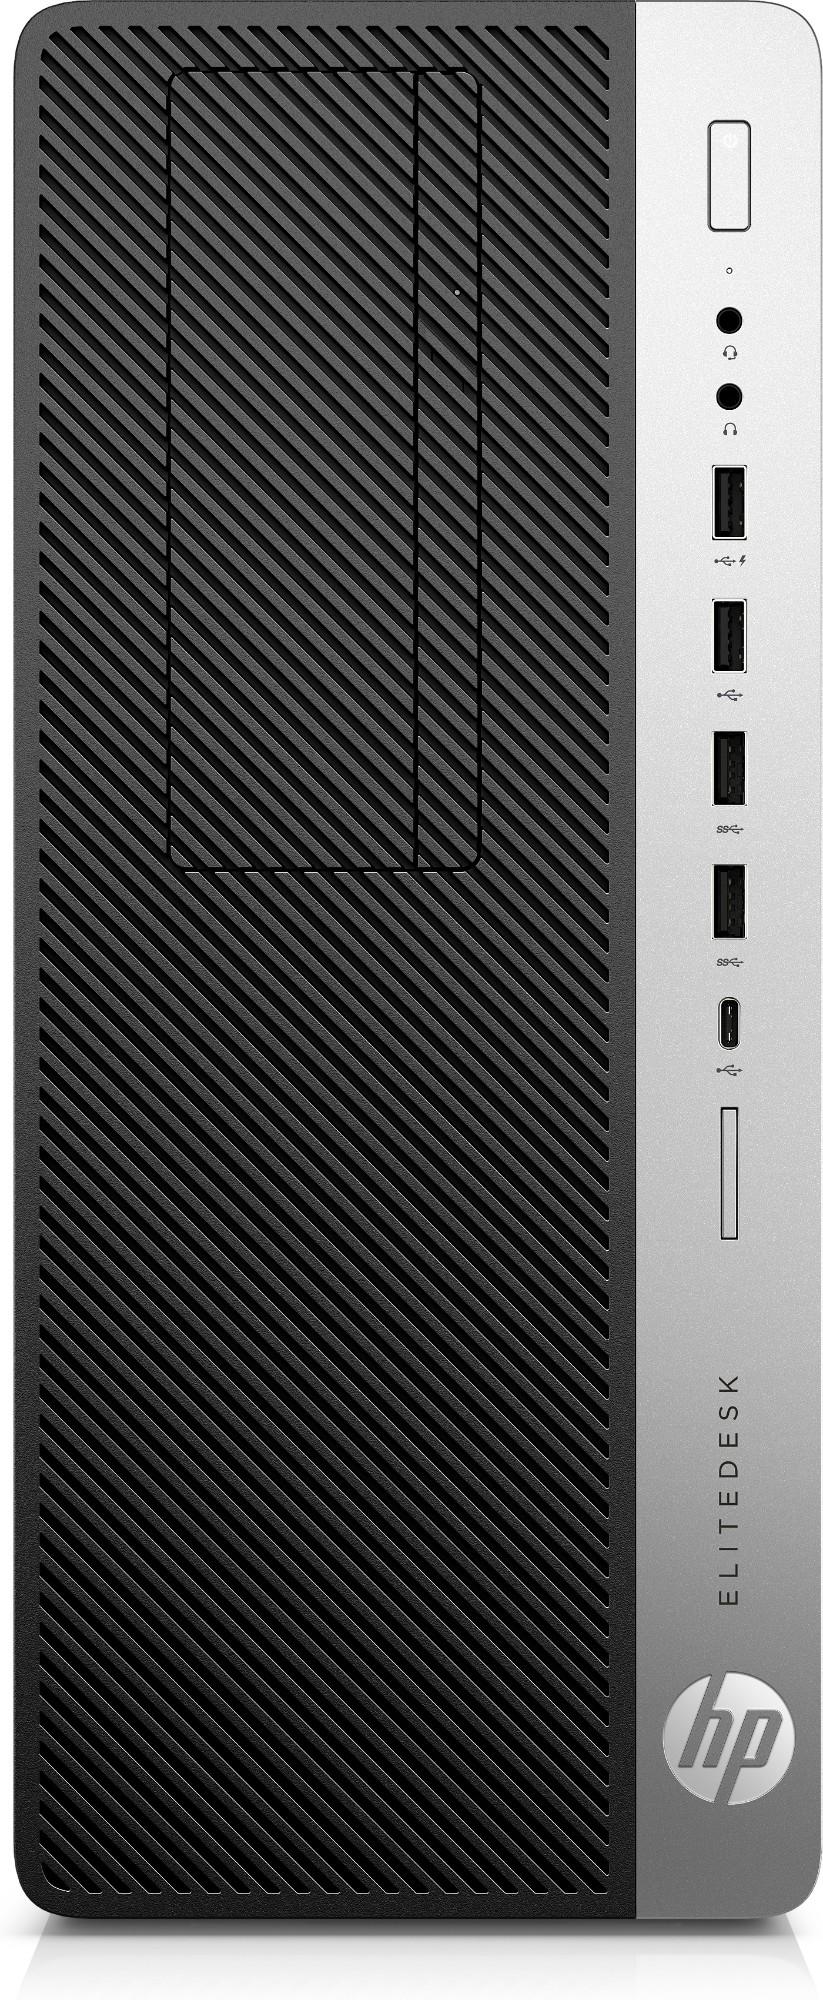 HP EliteDesk 800 G5 8th gen Intel® Core™ i5 i5-8500 8 GB DDR4-SDRAM 256 GB SSD Black Tower PC